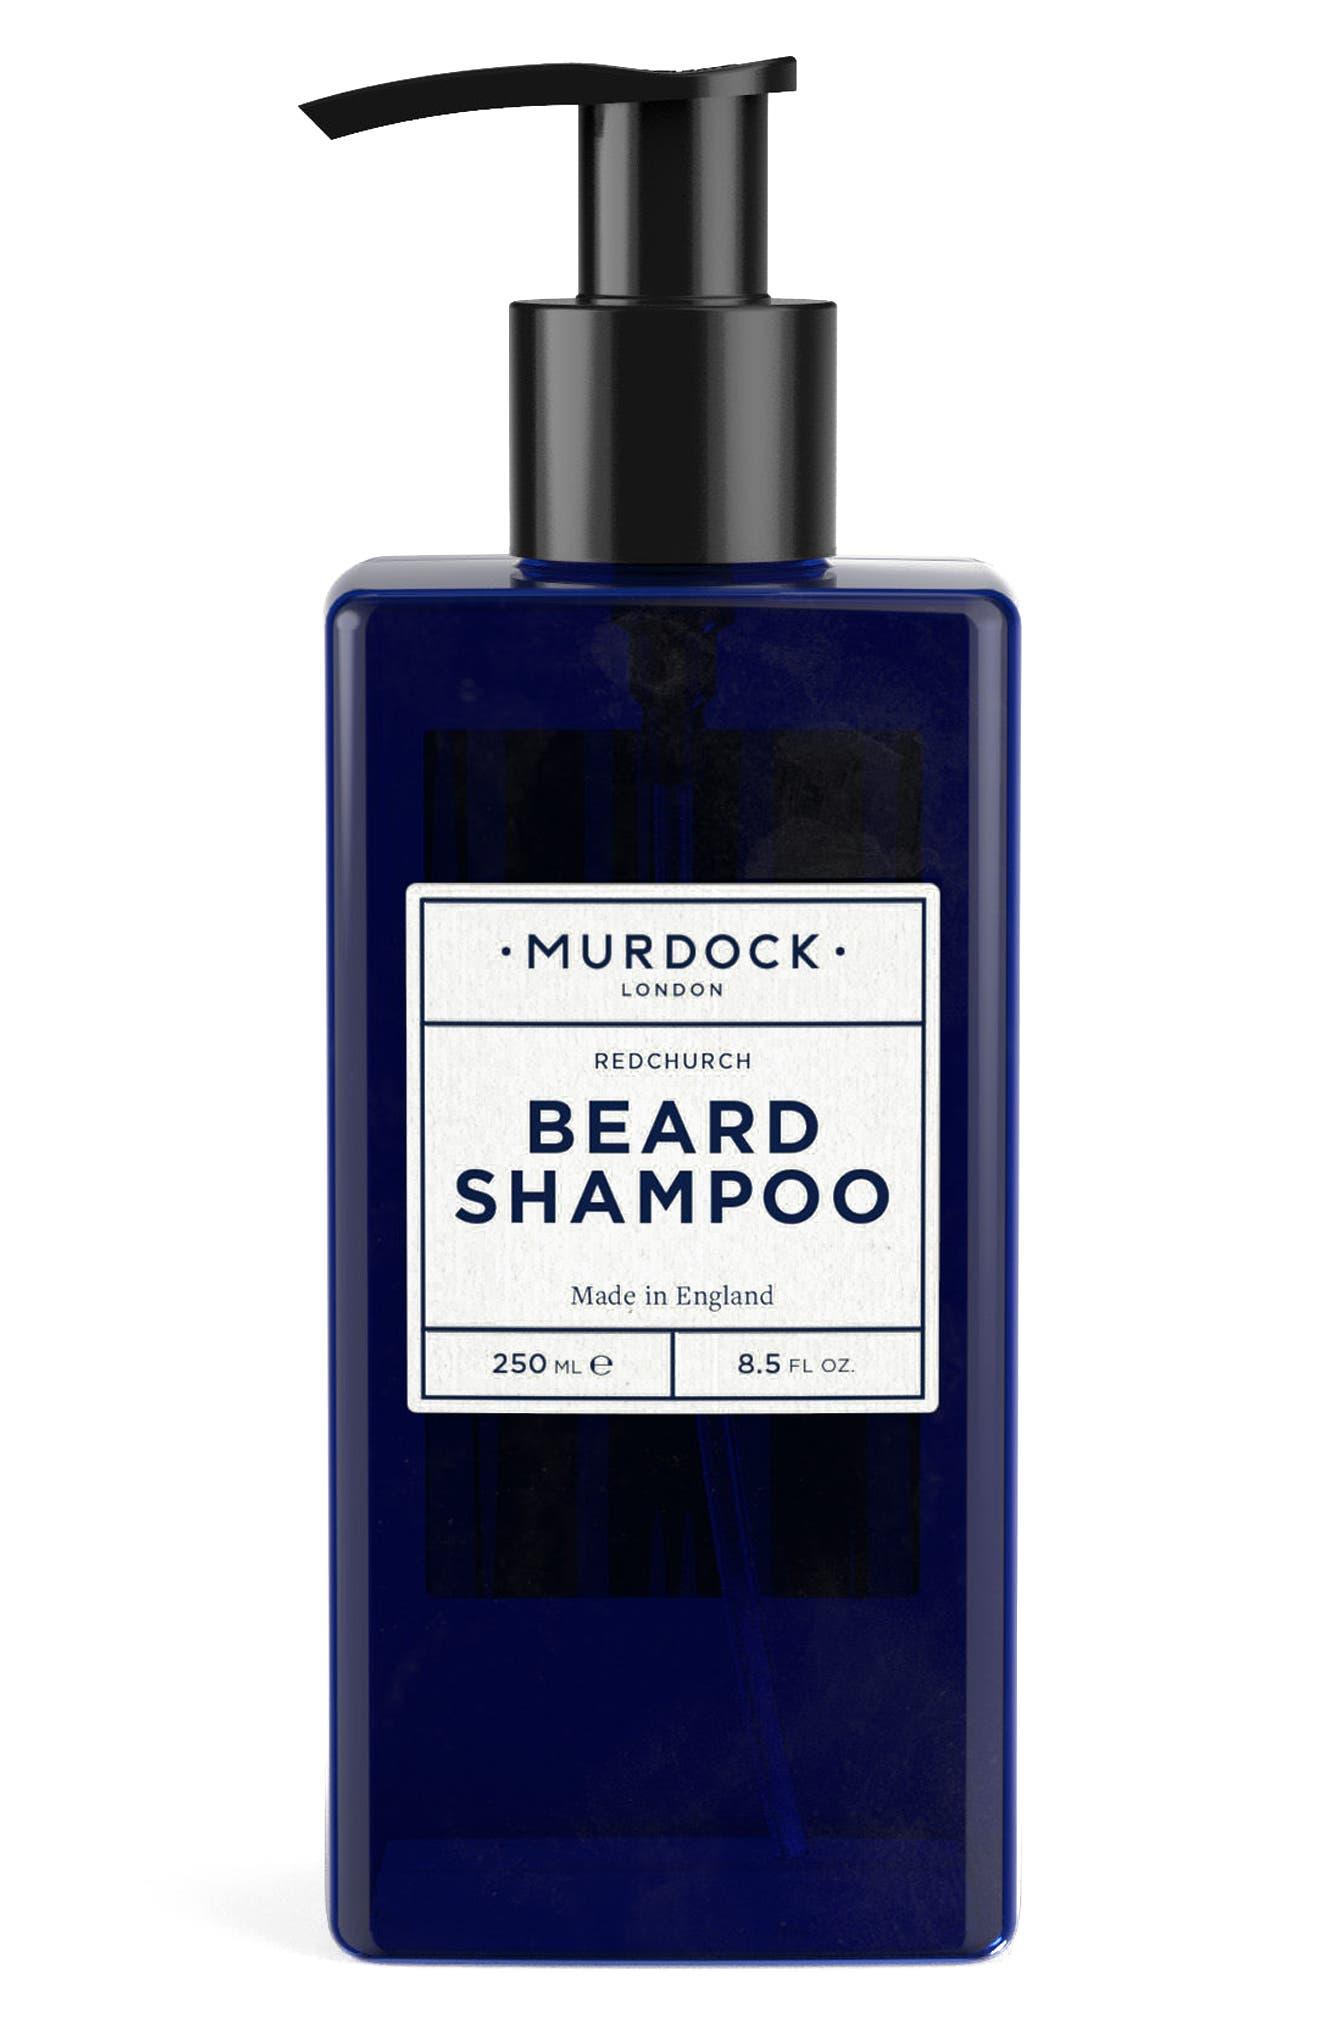 MURDOCK LONDON Beard Shampoo, Main, color, NO COLOR